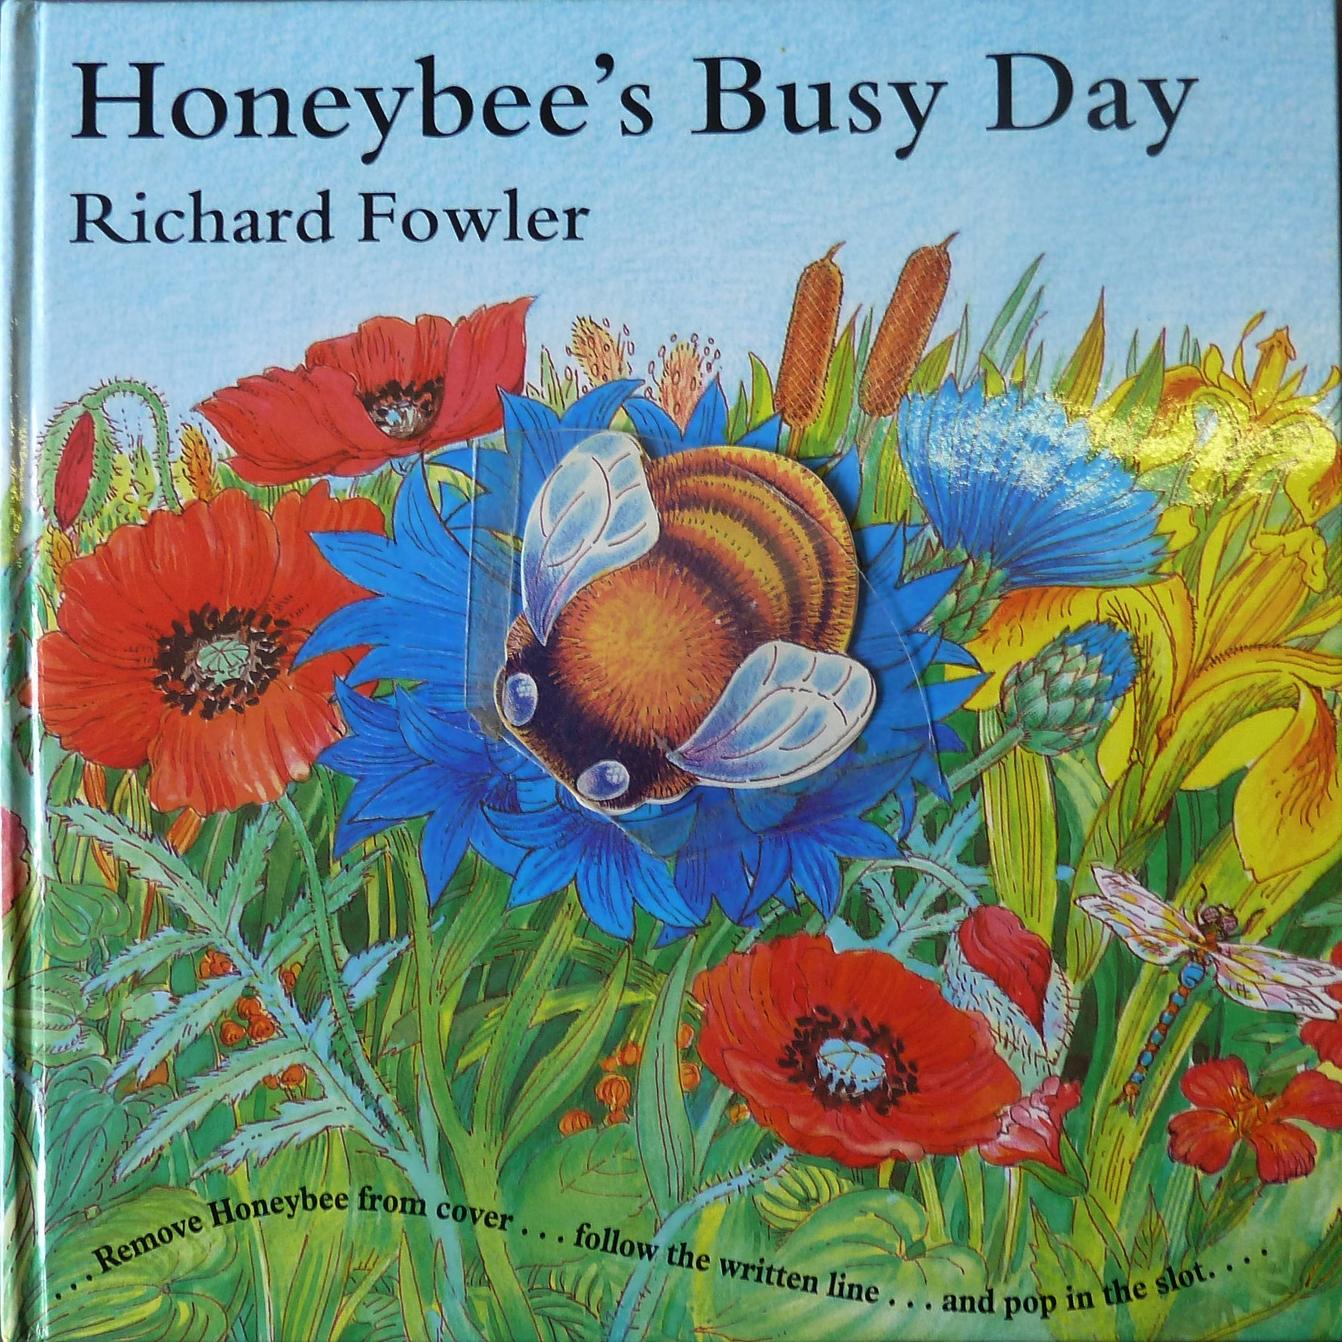 Honeybee's Busy Day